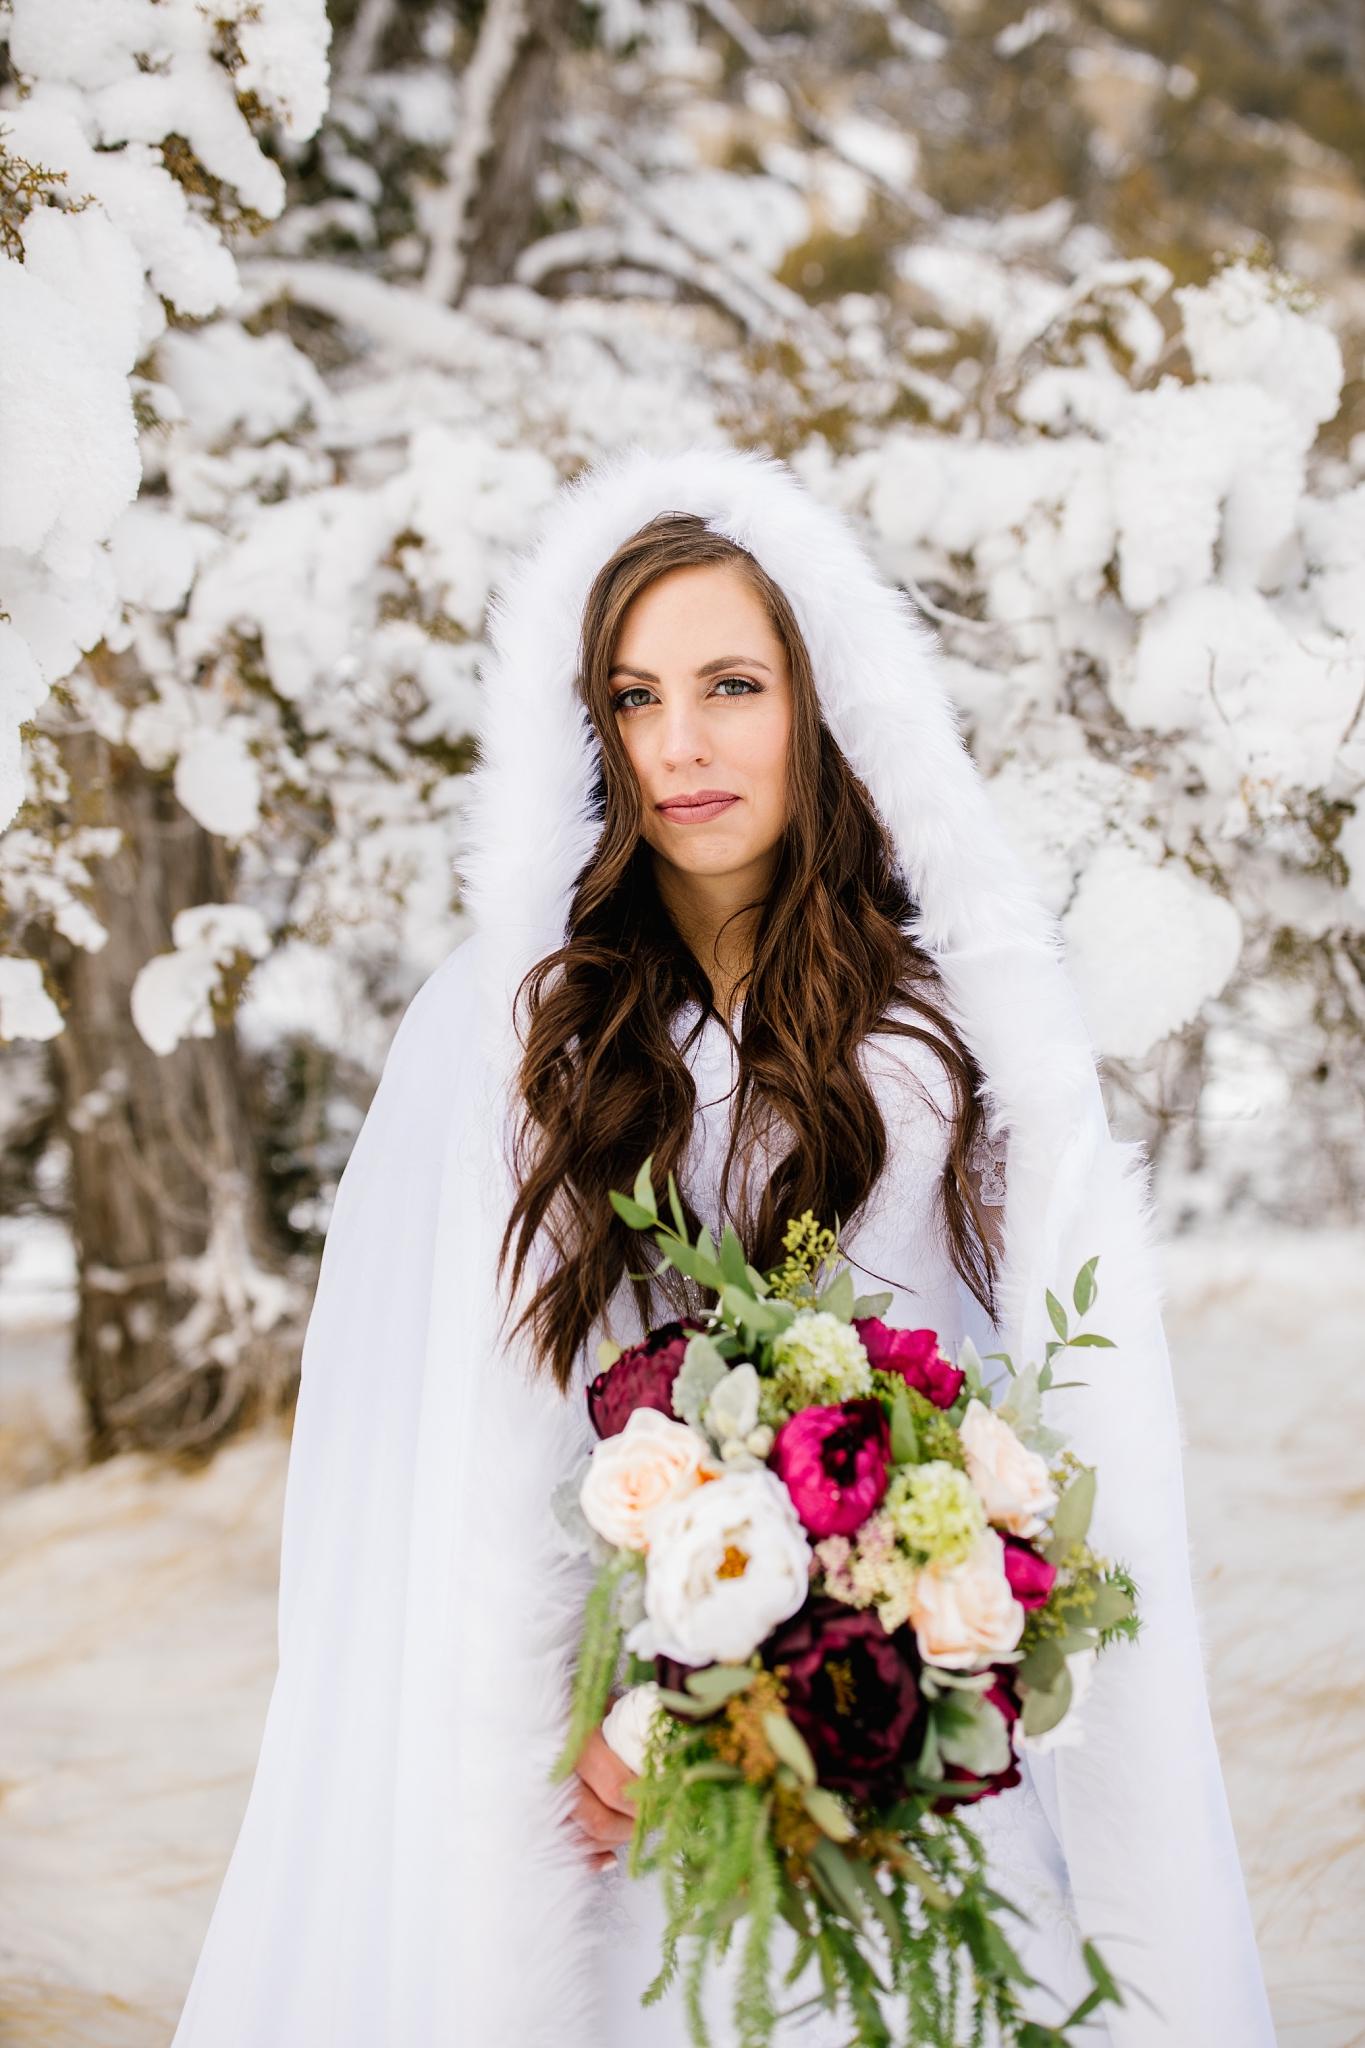 SSBridals-85_Lizzie-B-Imagery-Utah-Wedding-Photographer-Logan-Temple-Logan-Canyon-Mountain-Horse-Session.jpg